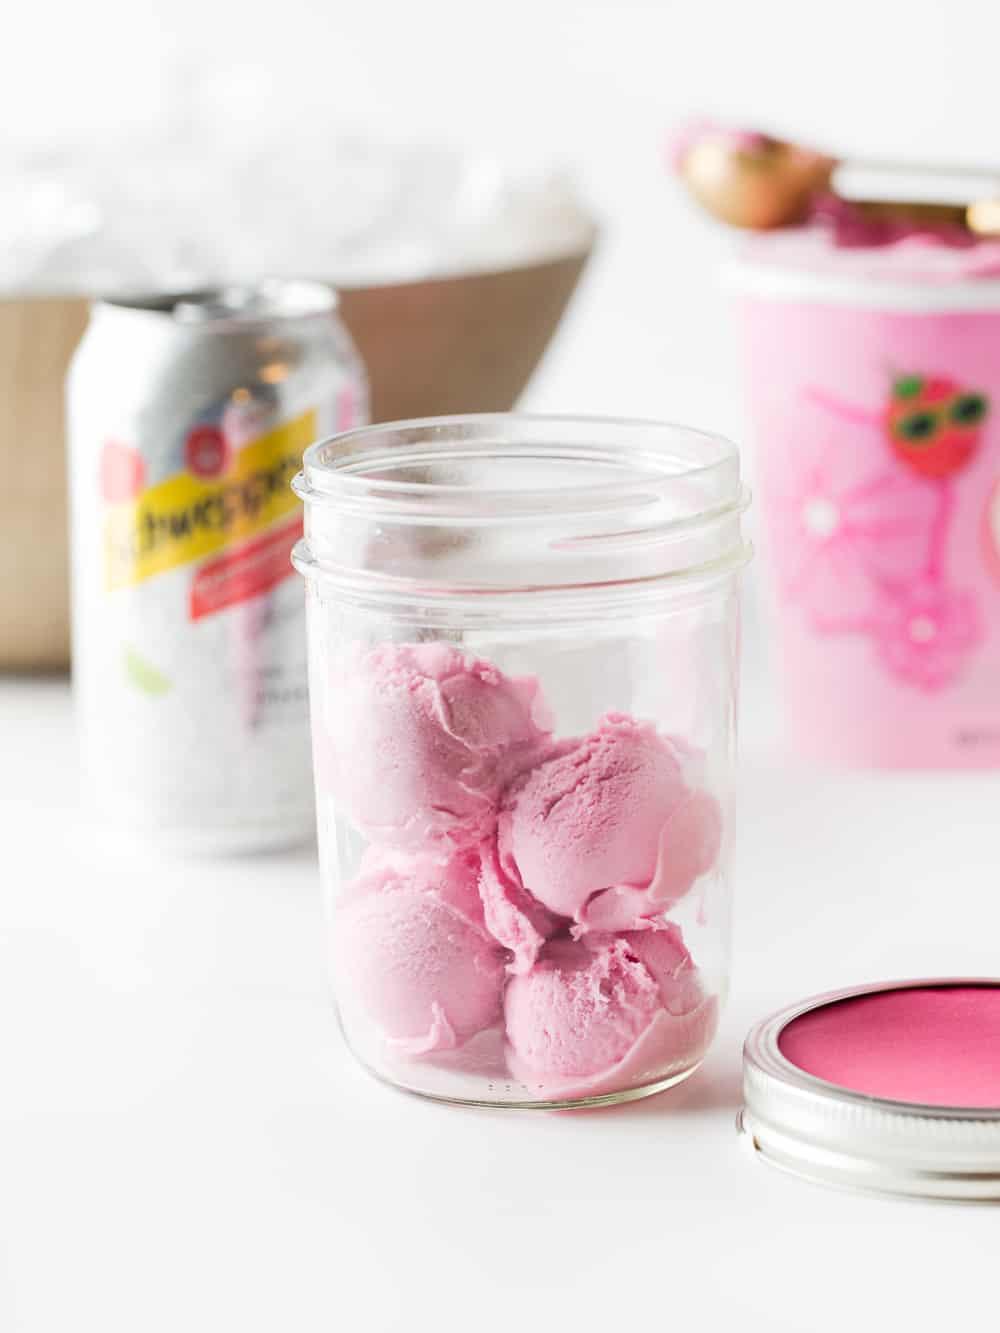 Scoops of raspberry sherbet in mason jar to make DIY punch bar.